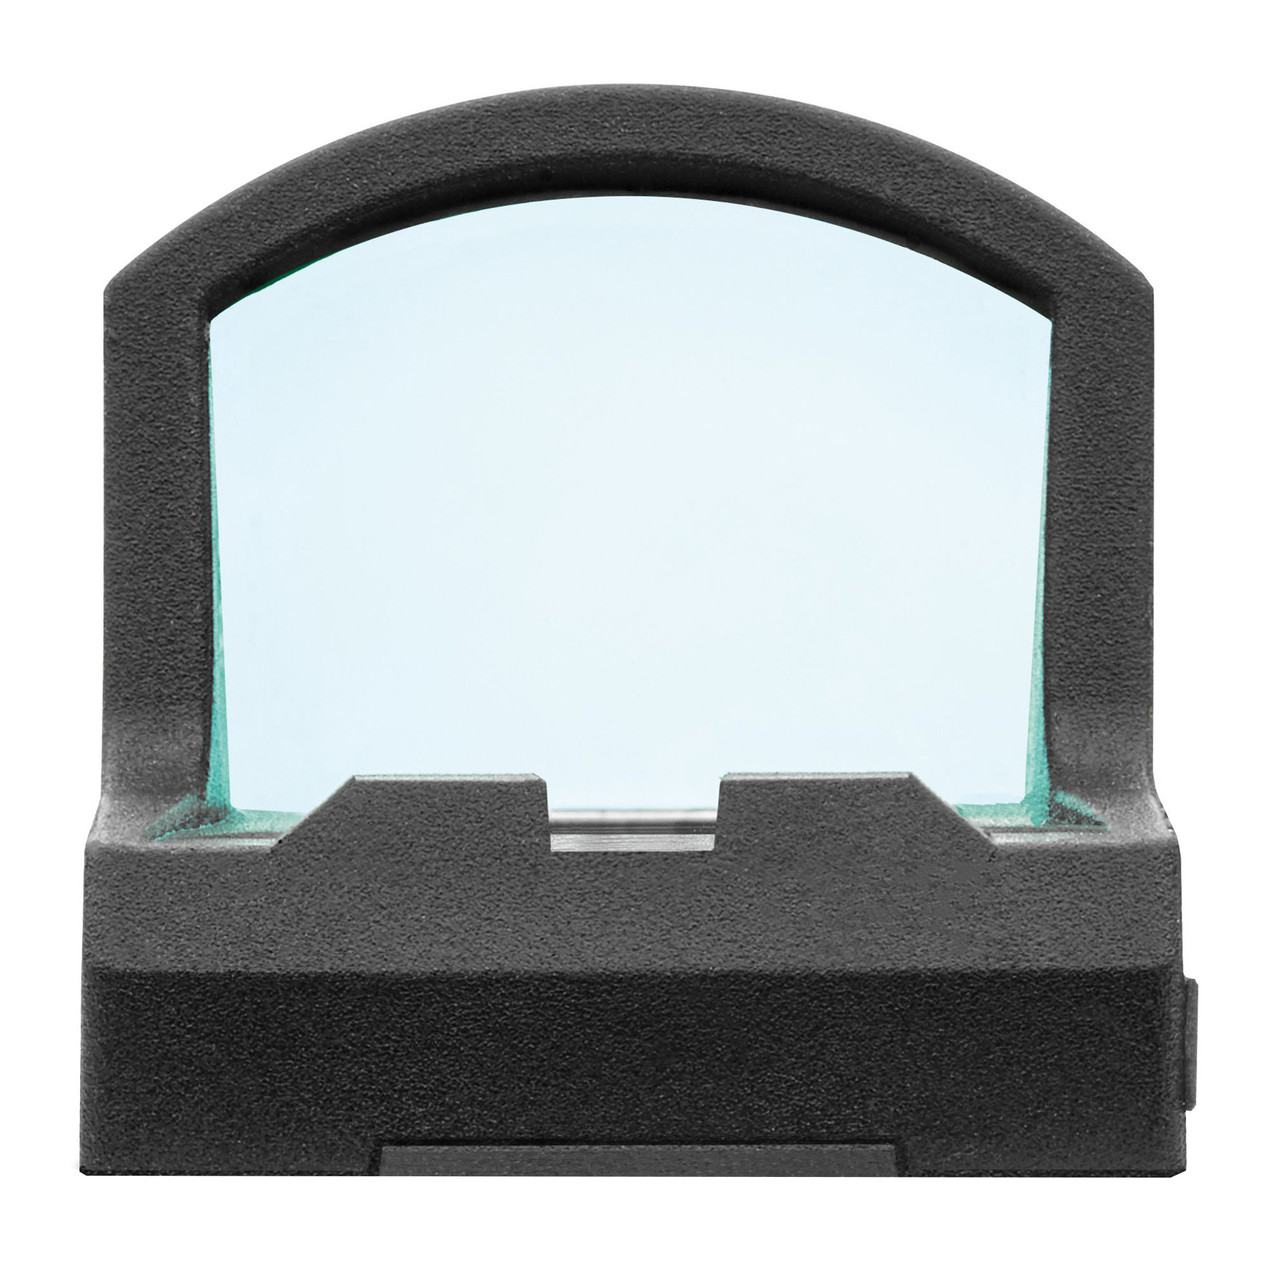 Sig Sauer Romeo Zero Micro Reflex Sight (3 MOA)